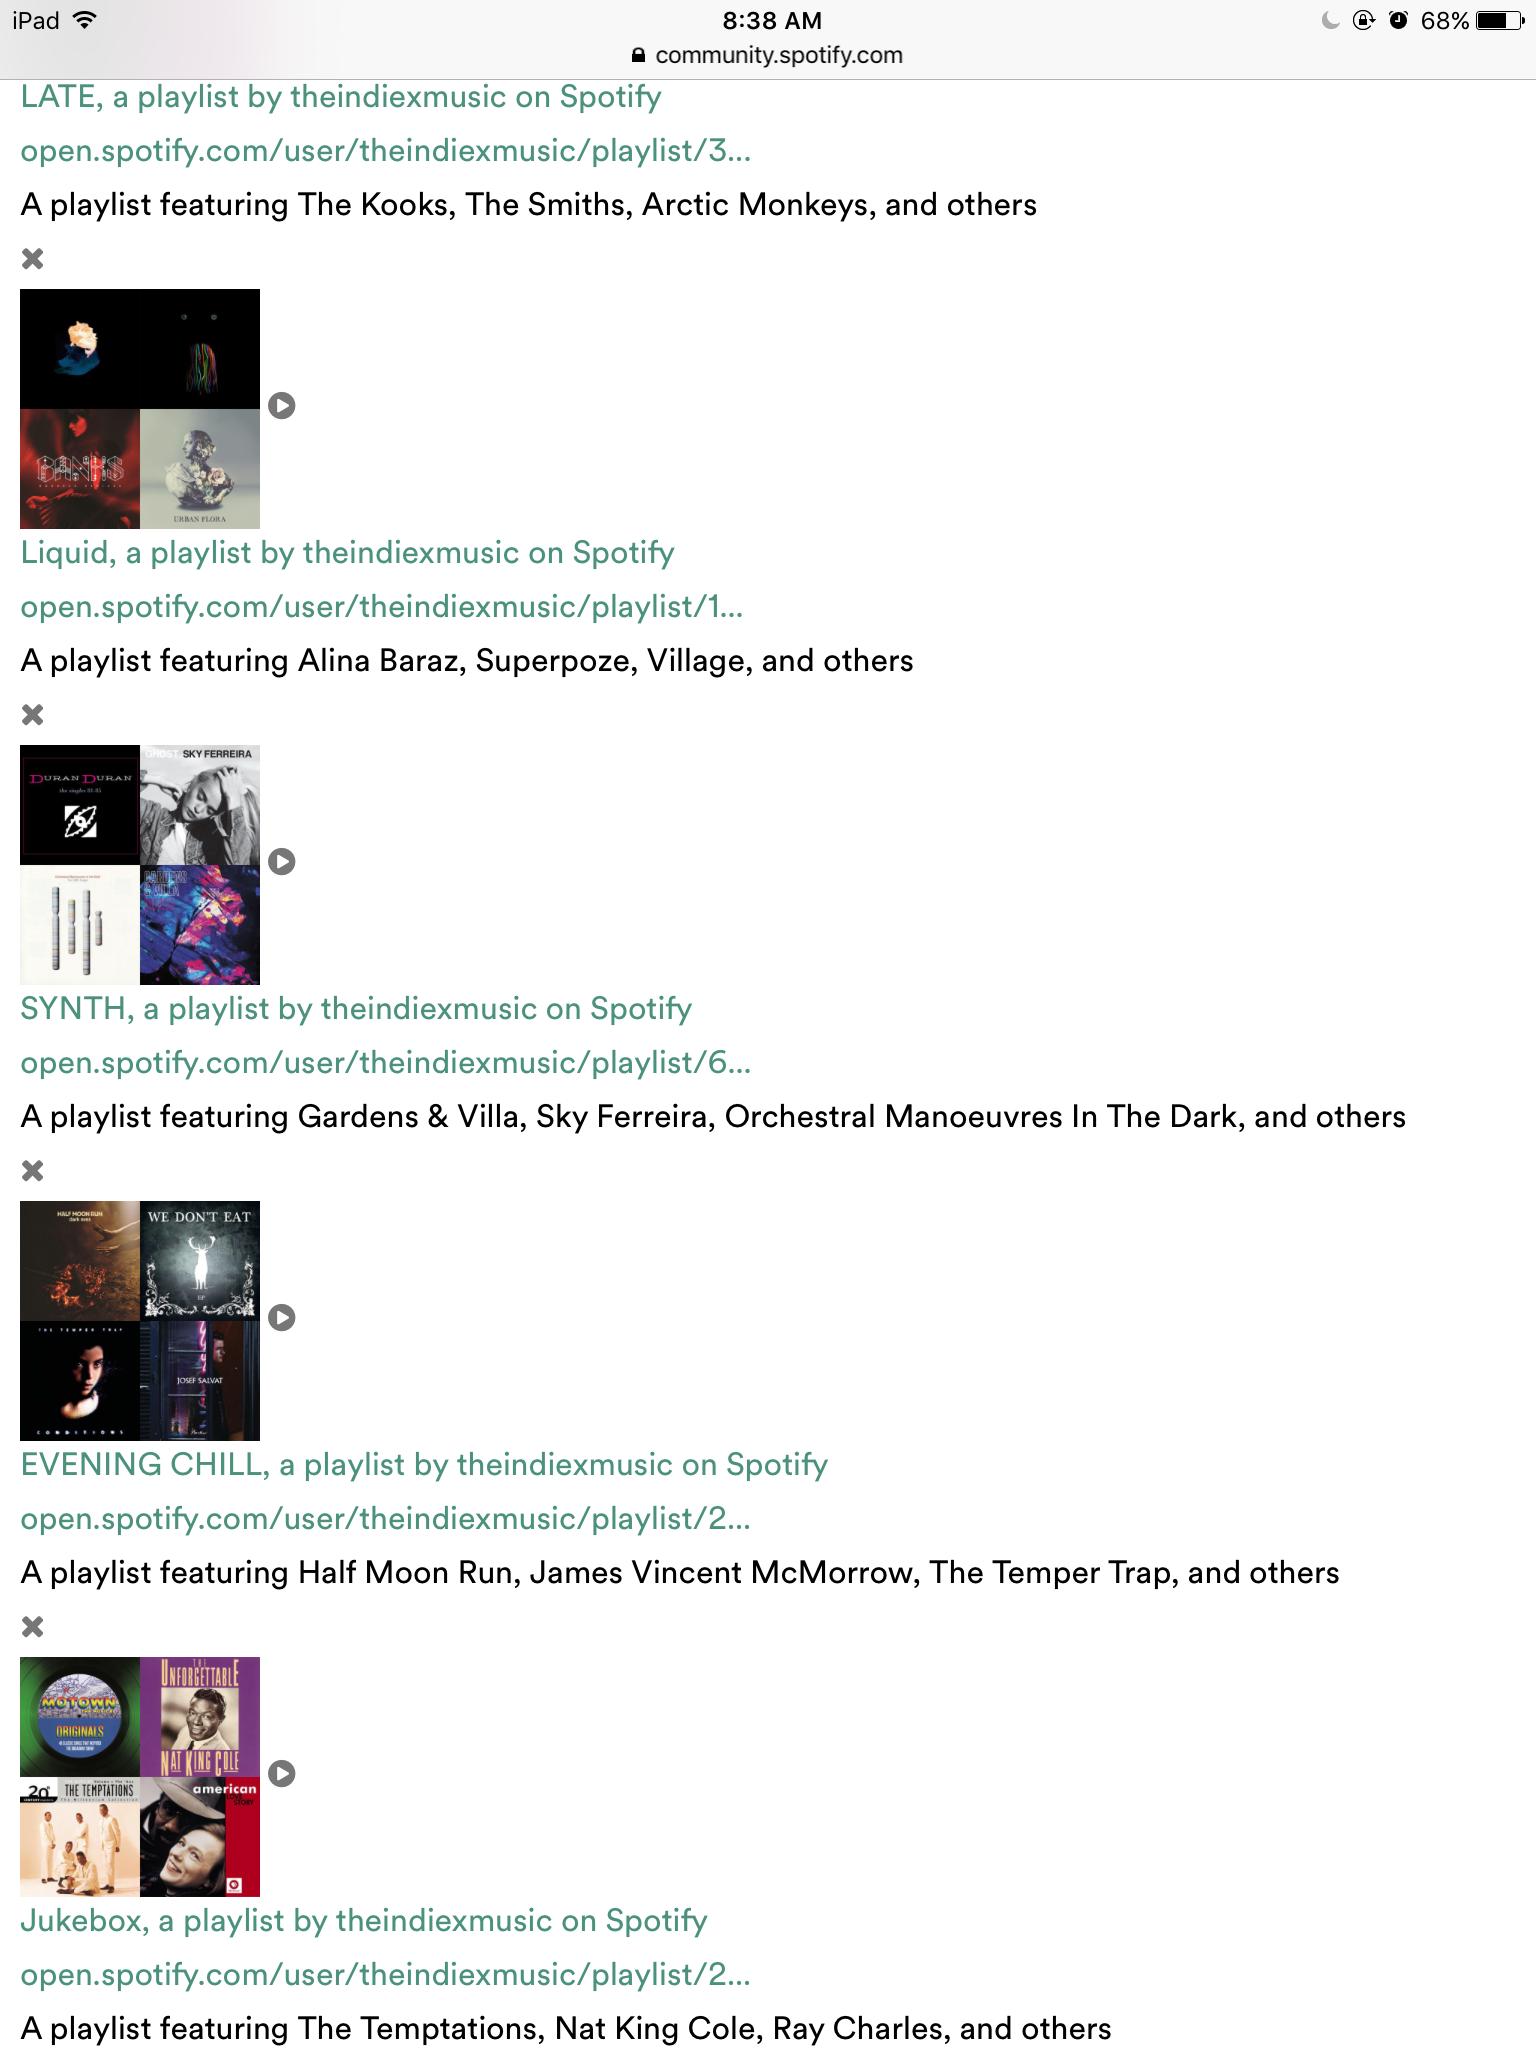 Broaden my music taste? - The Spotify Community